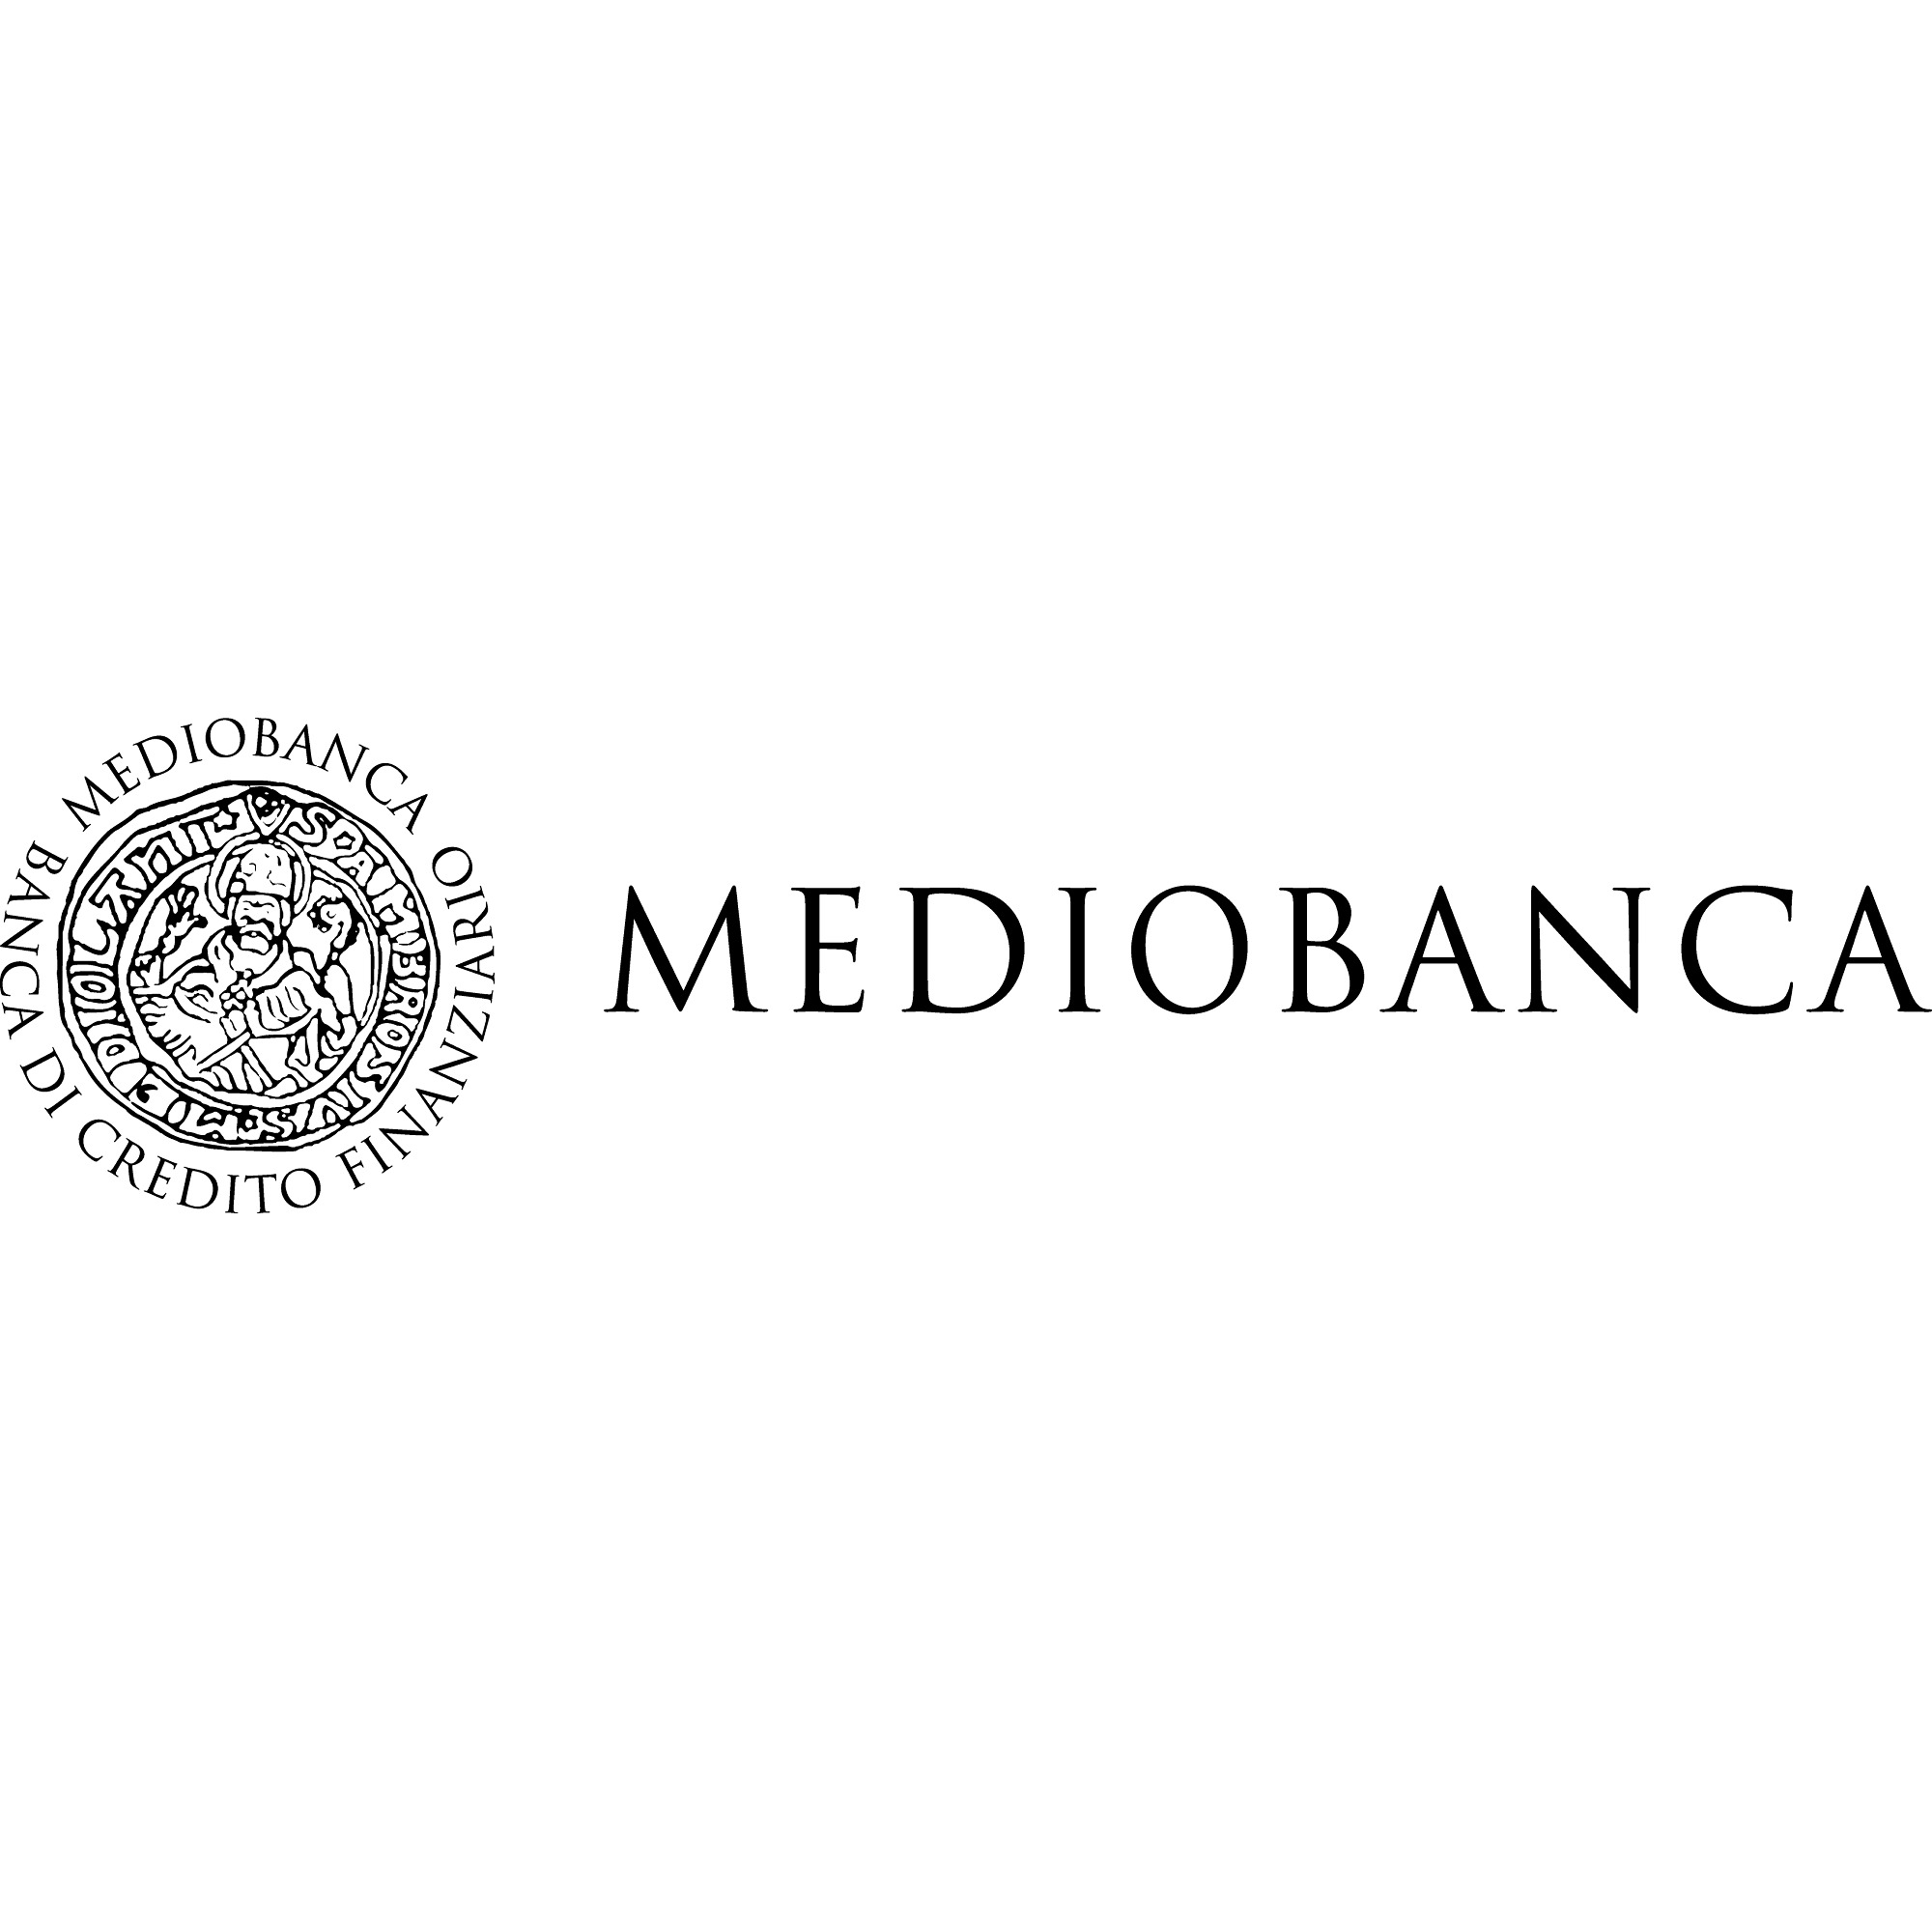 the Mediobanca logo.